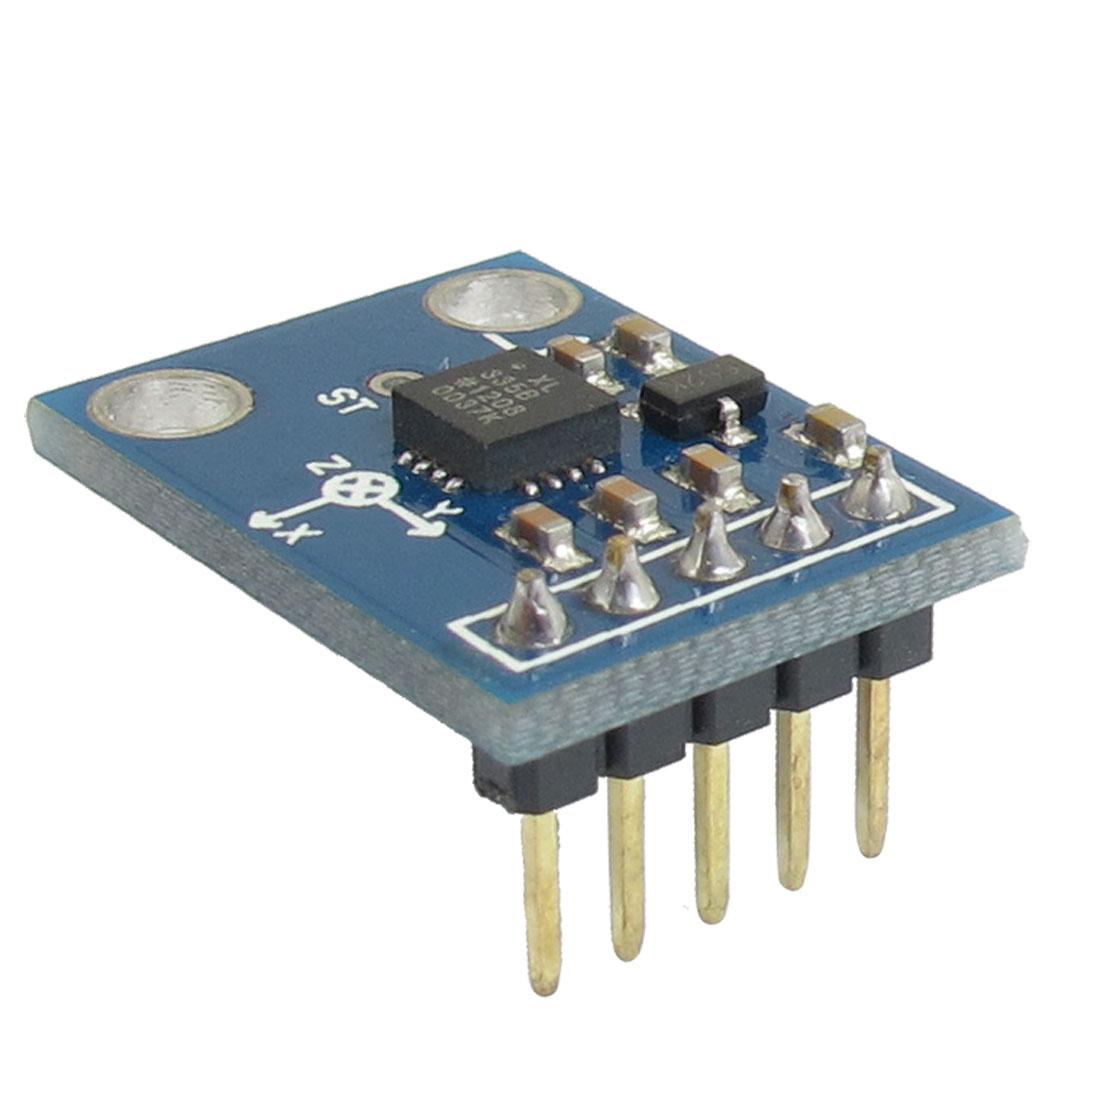 ADXL335 Module 3-axis Digital Gravity Angle Sensor Tilt Angle Module